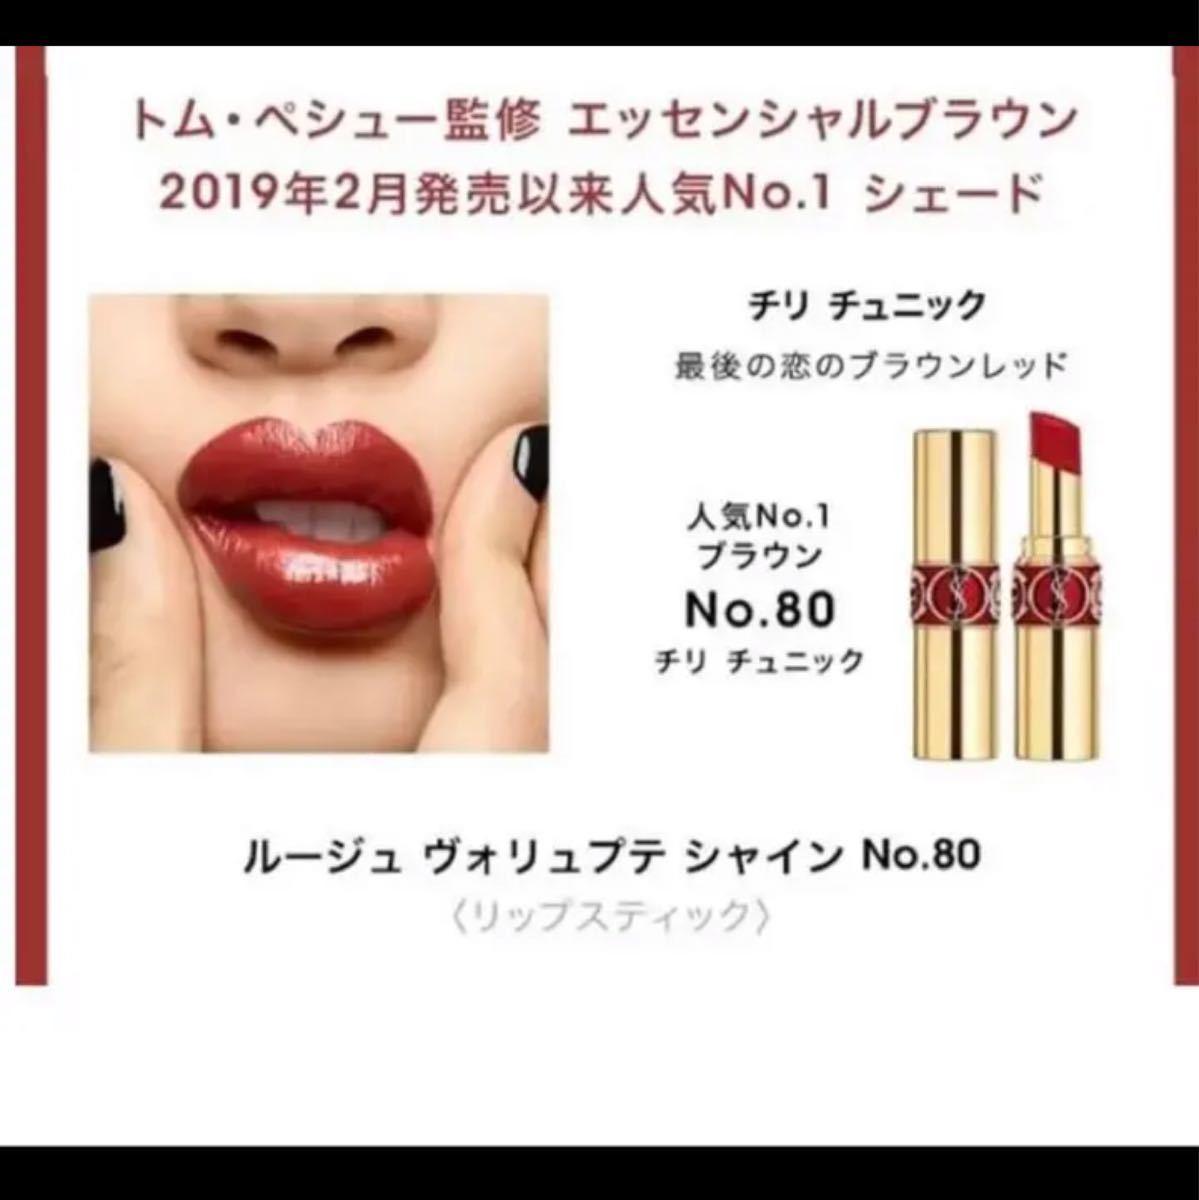 YSL No.1人気のルージュ ヴォリュプテ シャイン No.80